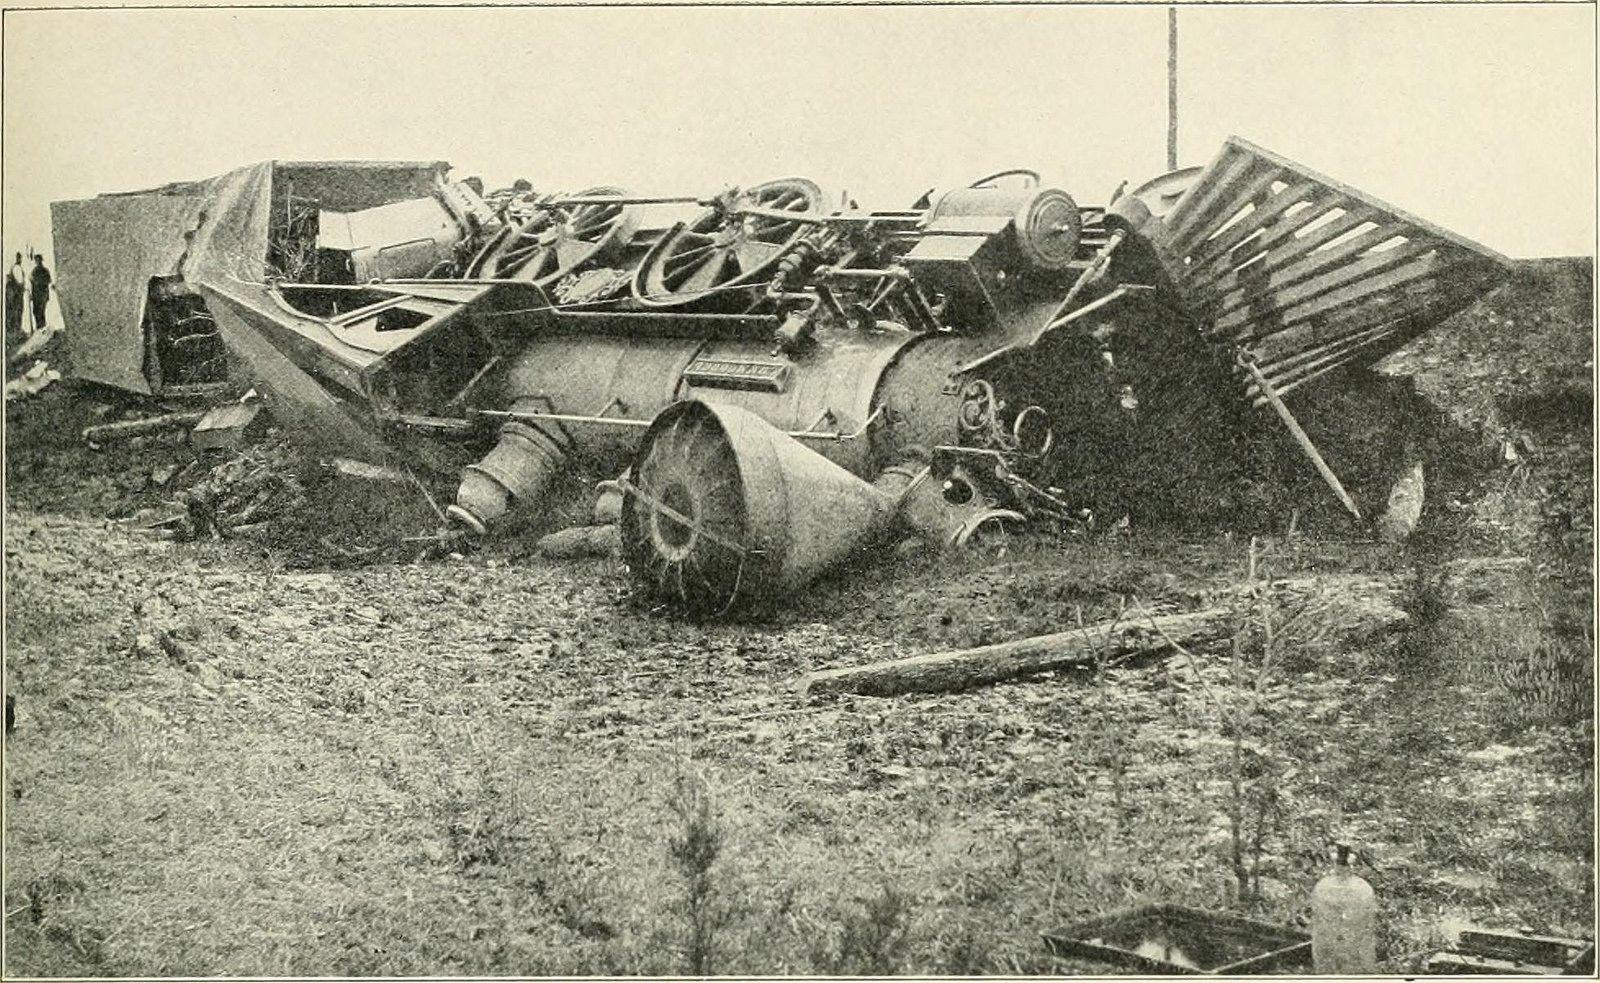 1860s Wrecked Train American Civil War Civil War History Civil War Civil War Photos